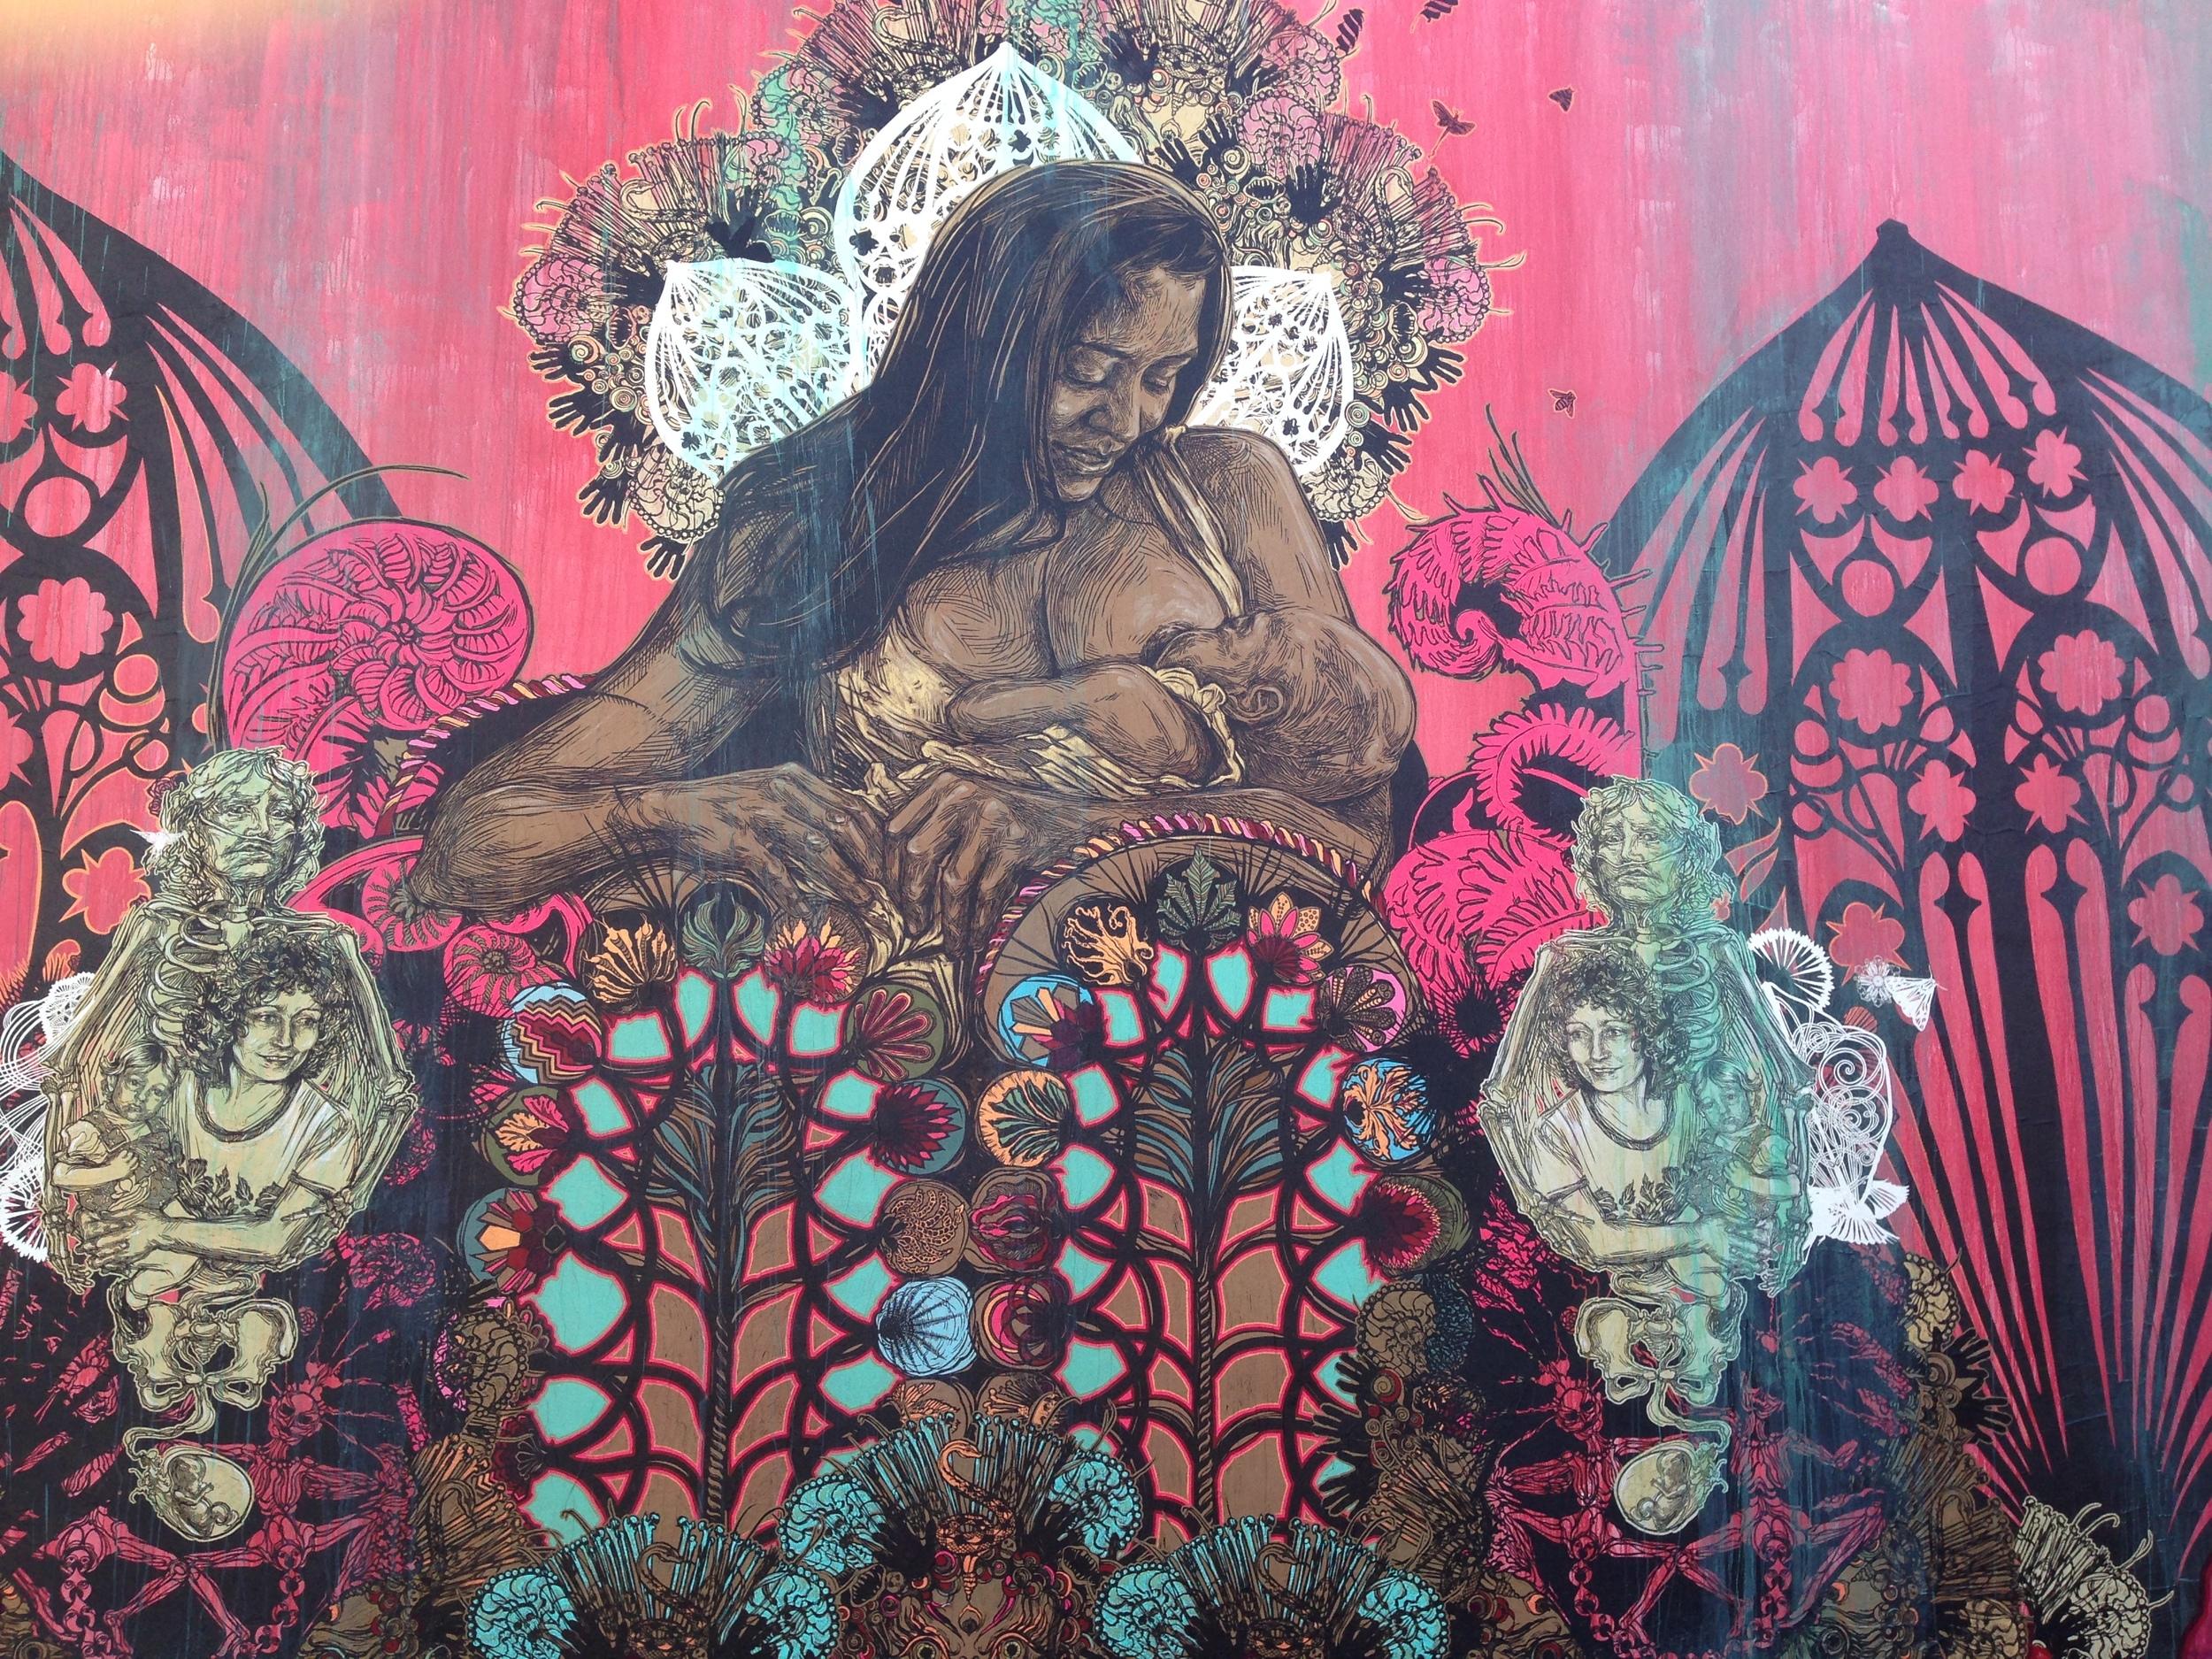 Swoon's 2014 installation for the Goldman Family's Wynwood Walls public art program. ( Photo : Swoon Studio)